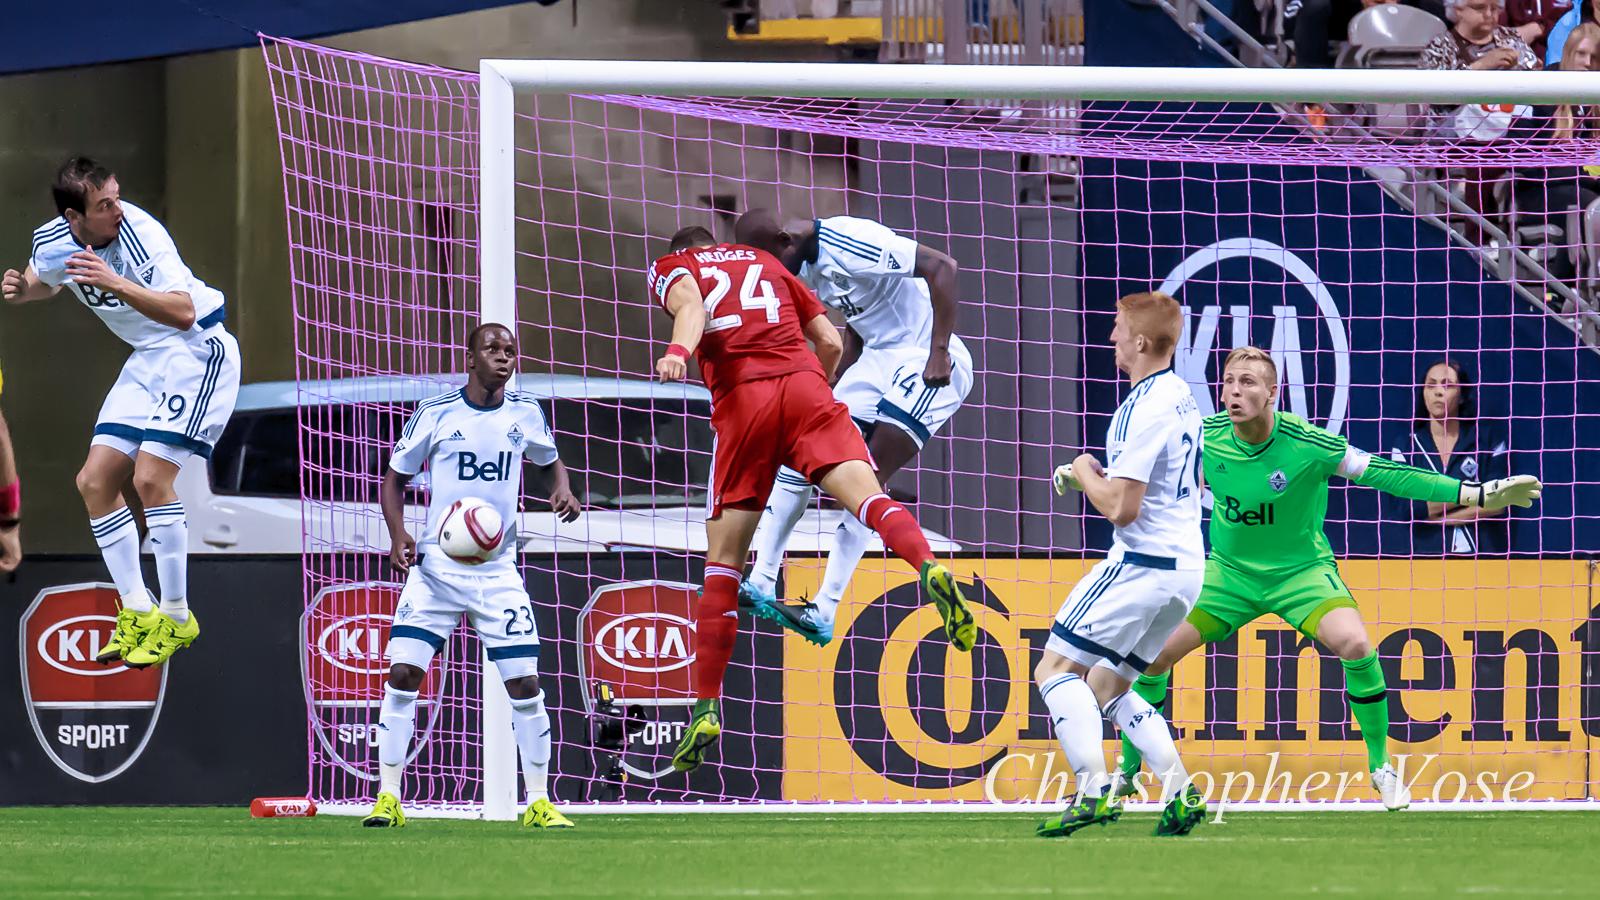 2015-10-07 Vancouver Whitecaps FC v FC Dallas.jpg